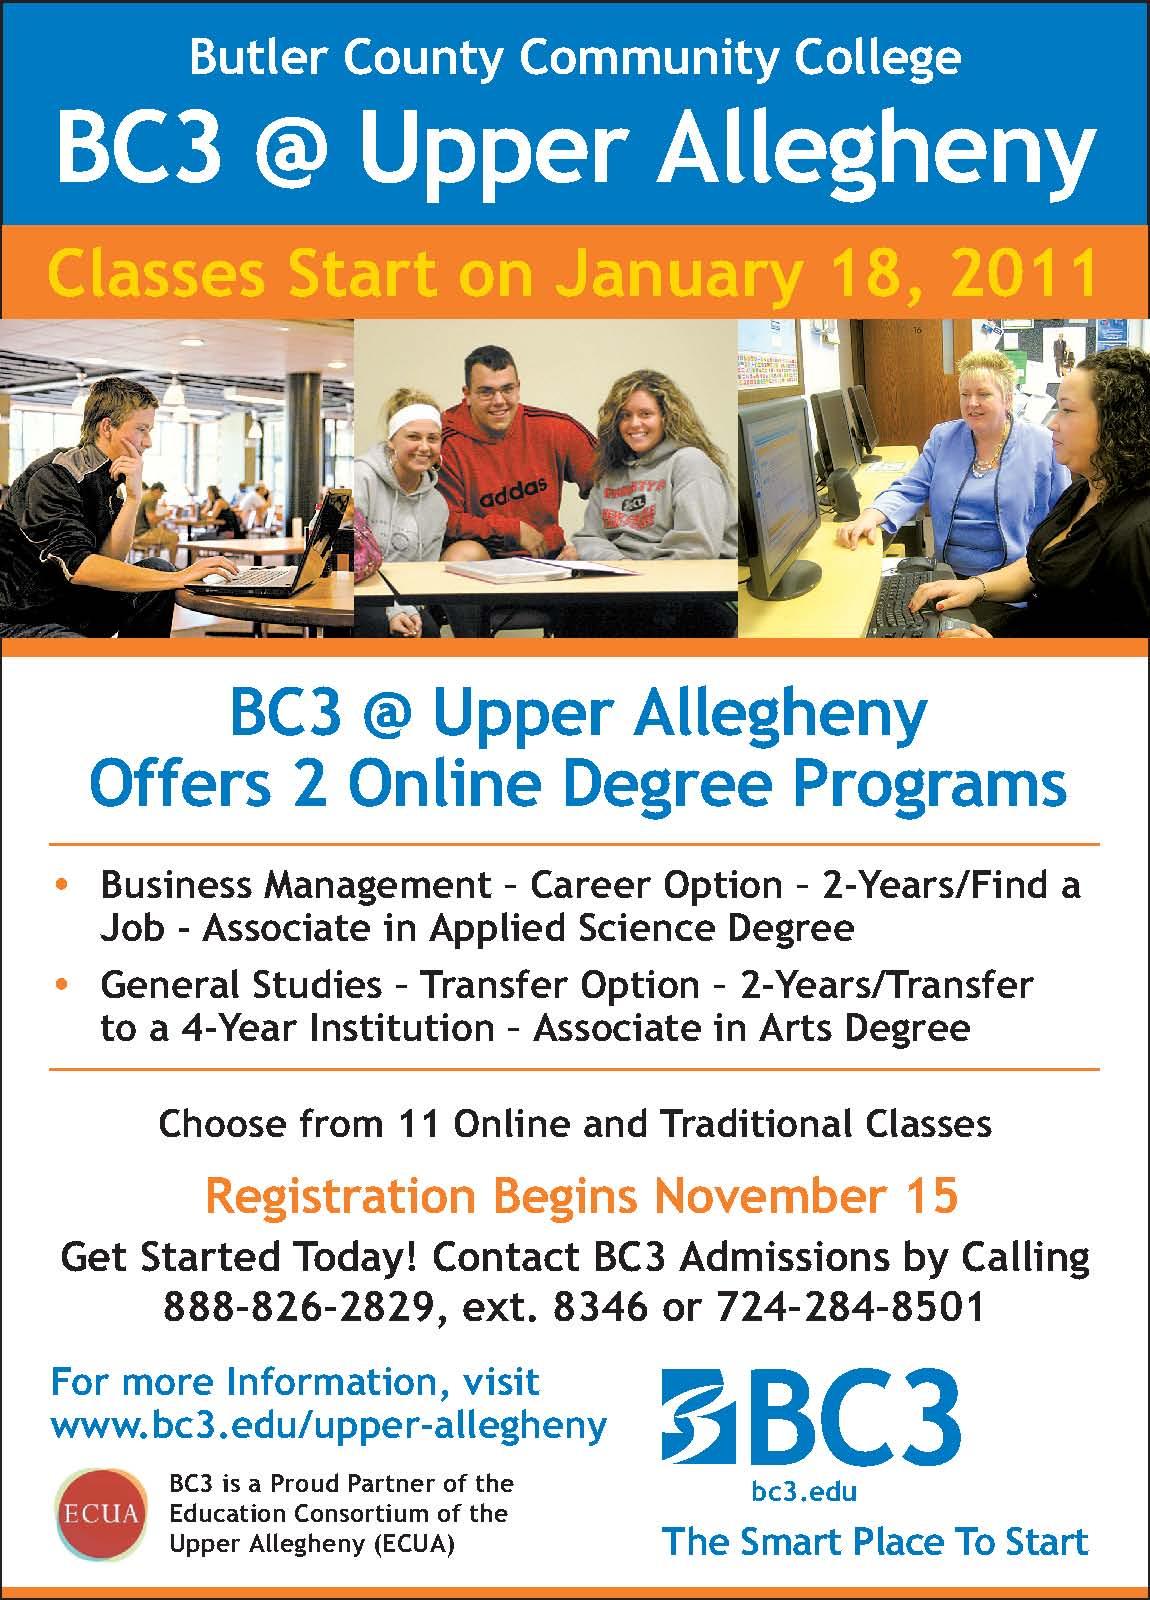 BC3 @ Upper Allegheny   BC3 President's Blog